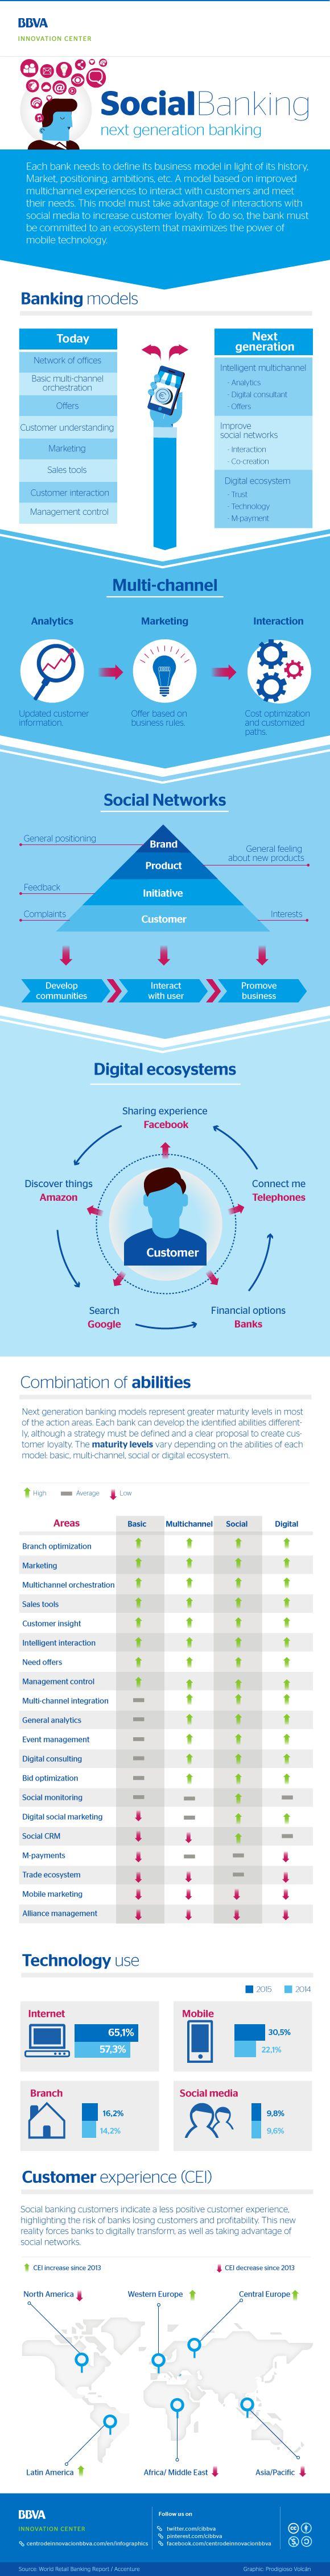 Infograph: Social Banking, next generation banking - BBVA Innovation Center